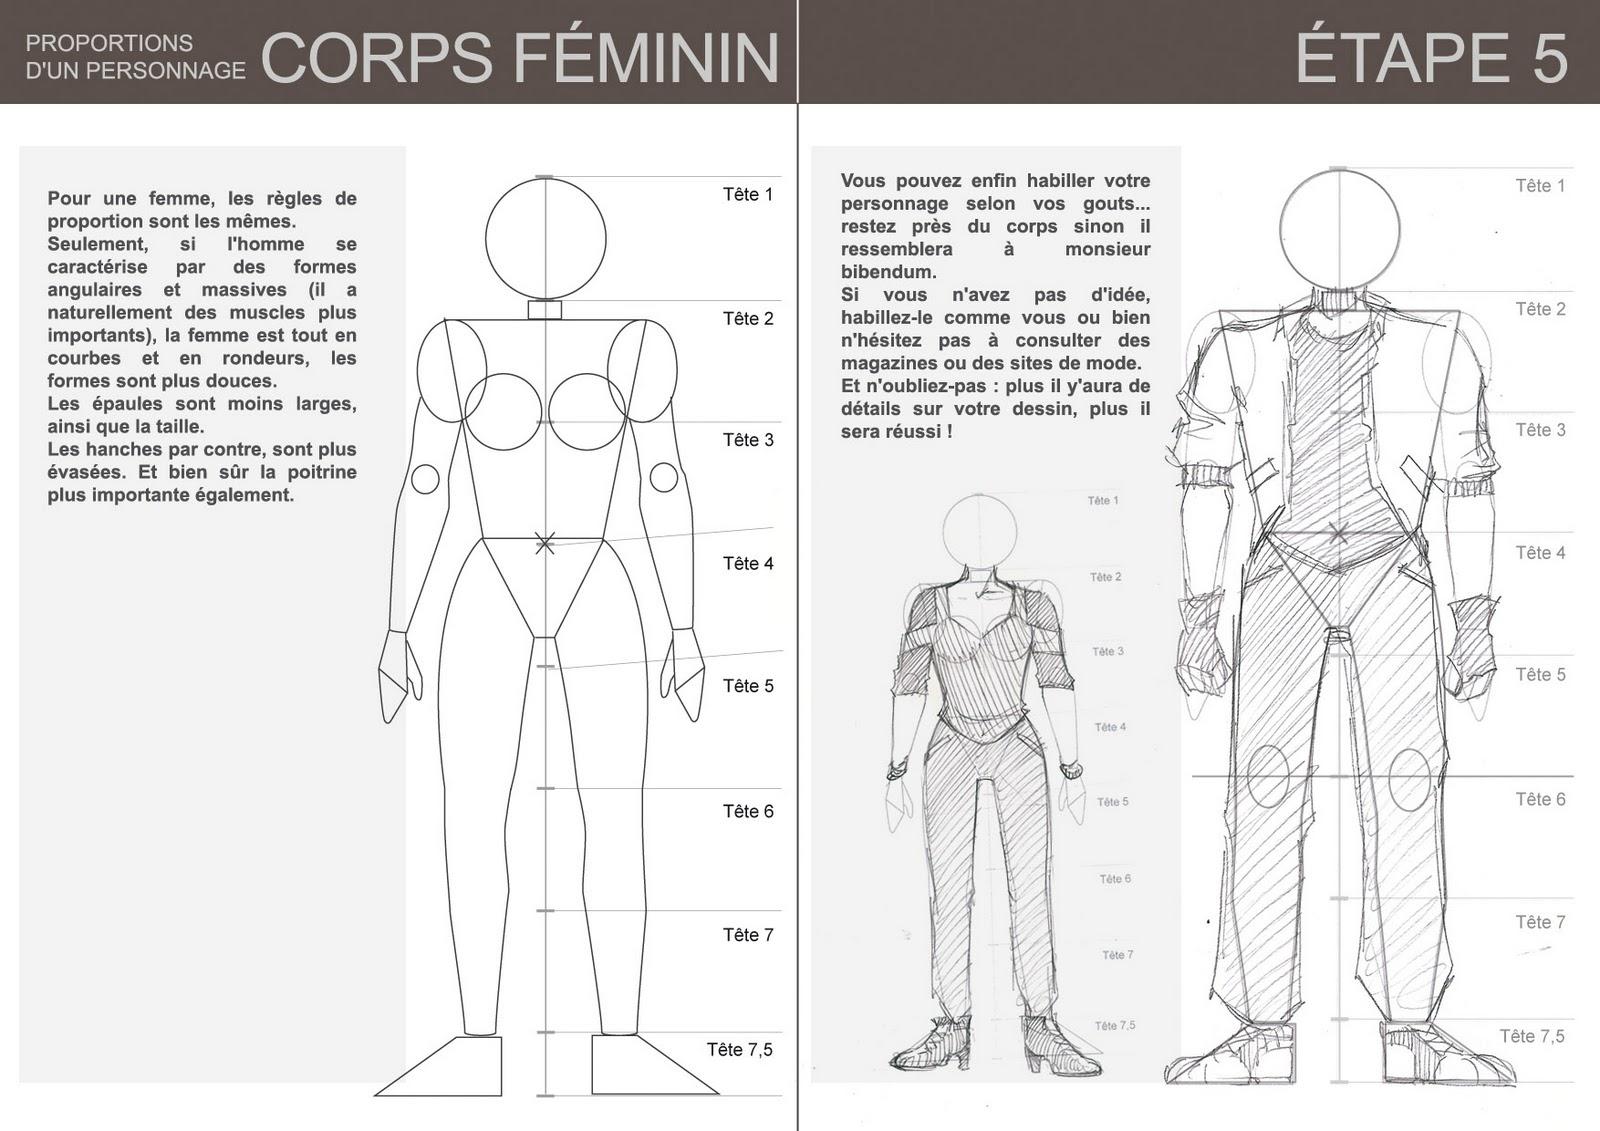 https://www.imedias.pro/cours-en-ligne/logiciels/illustrator/bases-dessin-vectoriel/